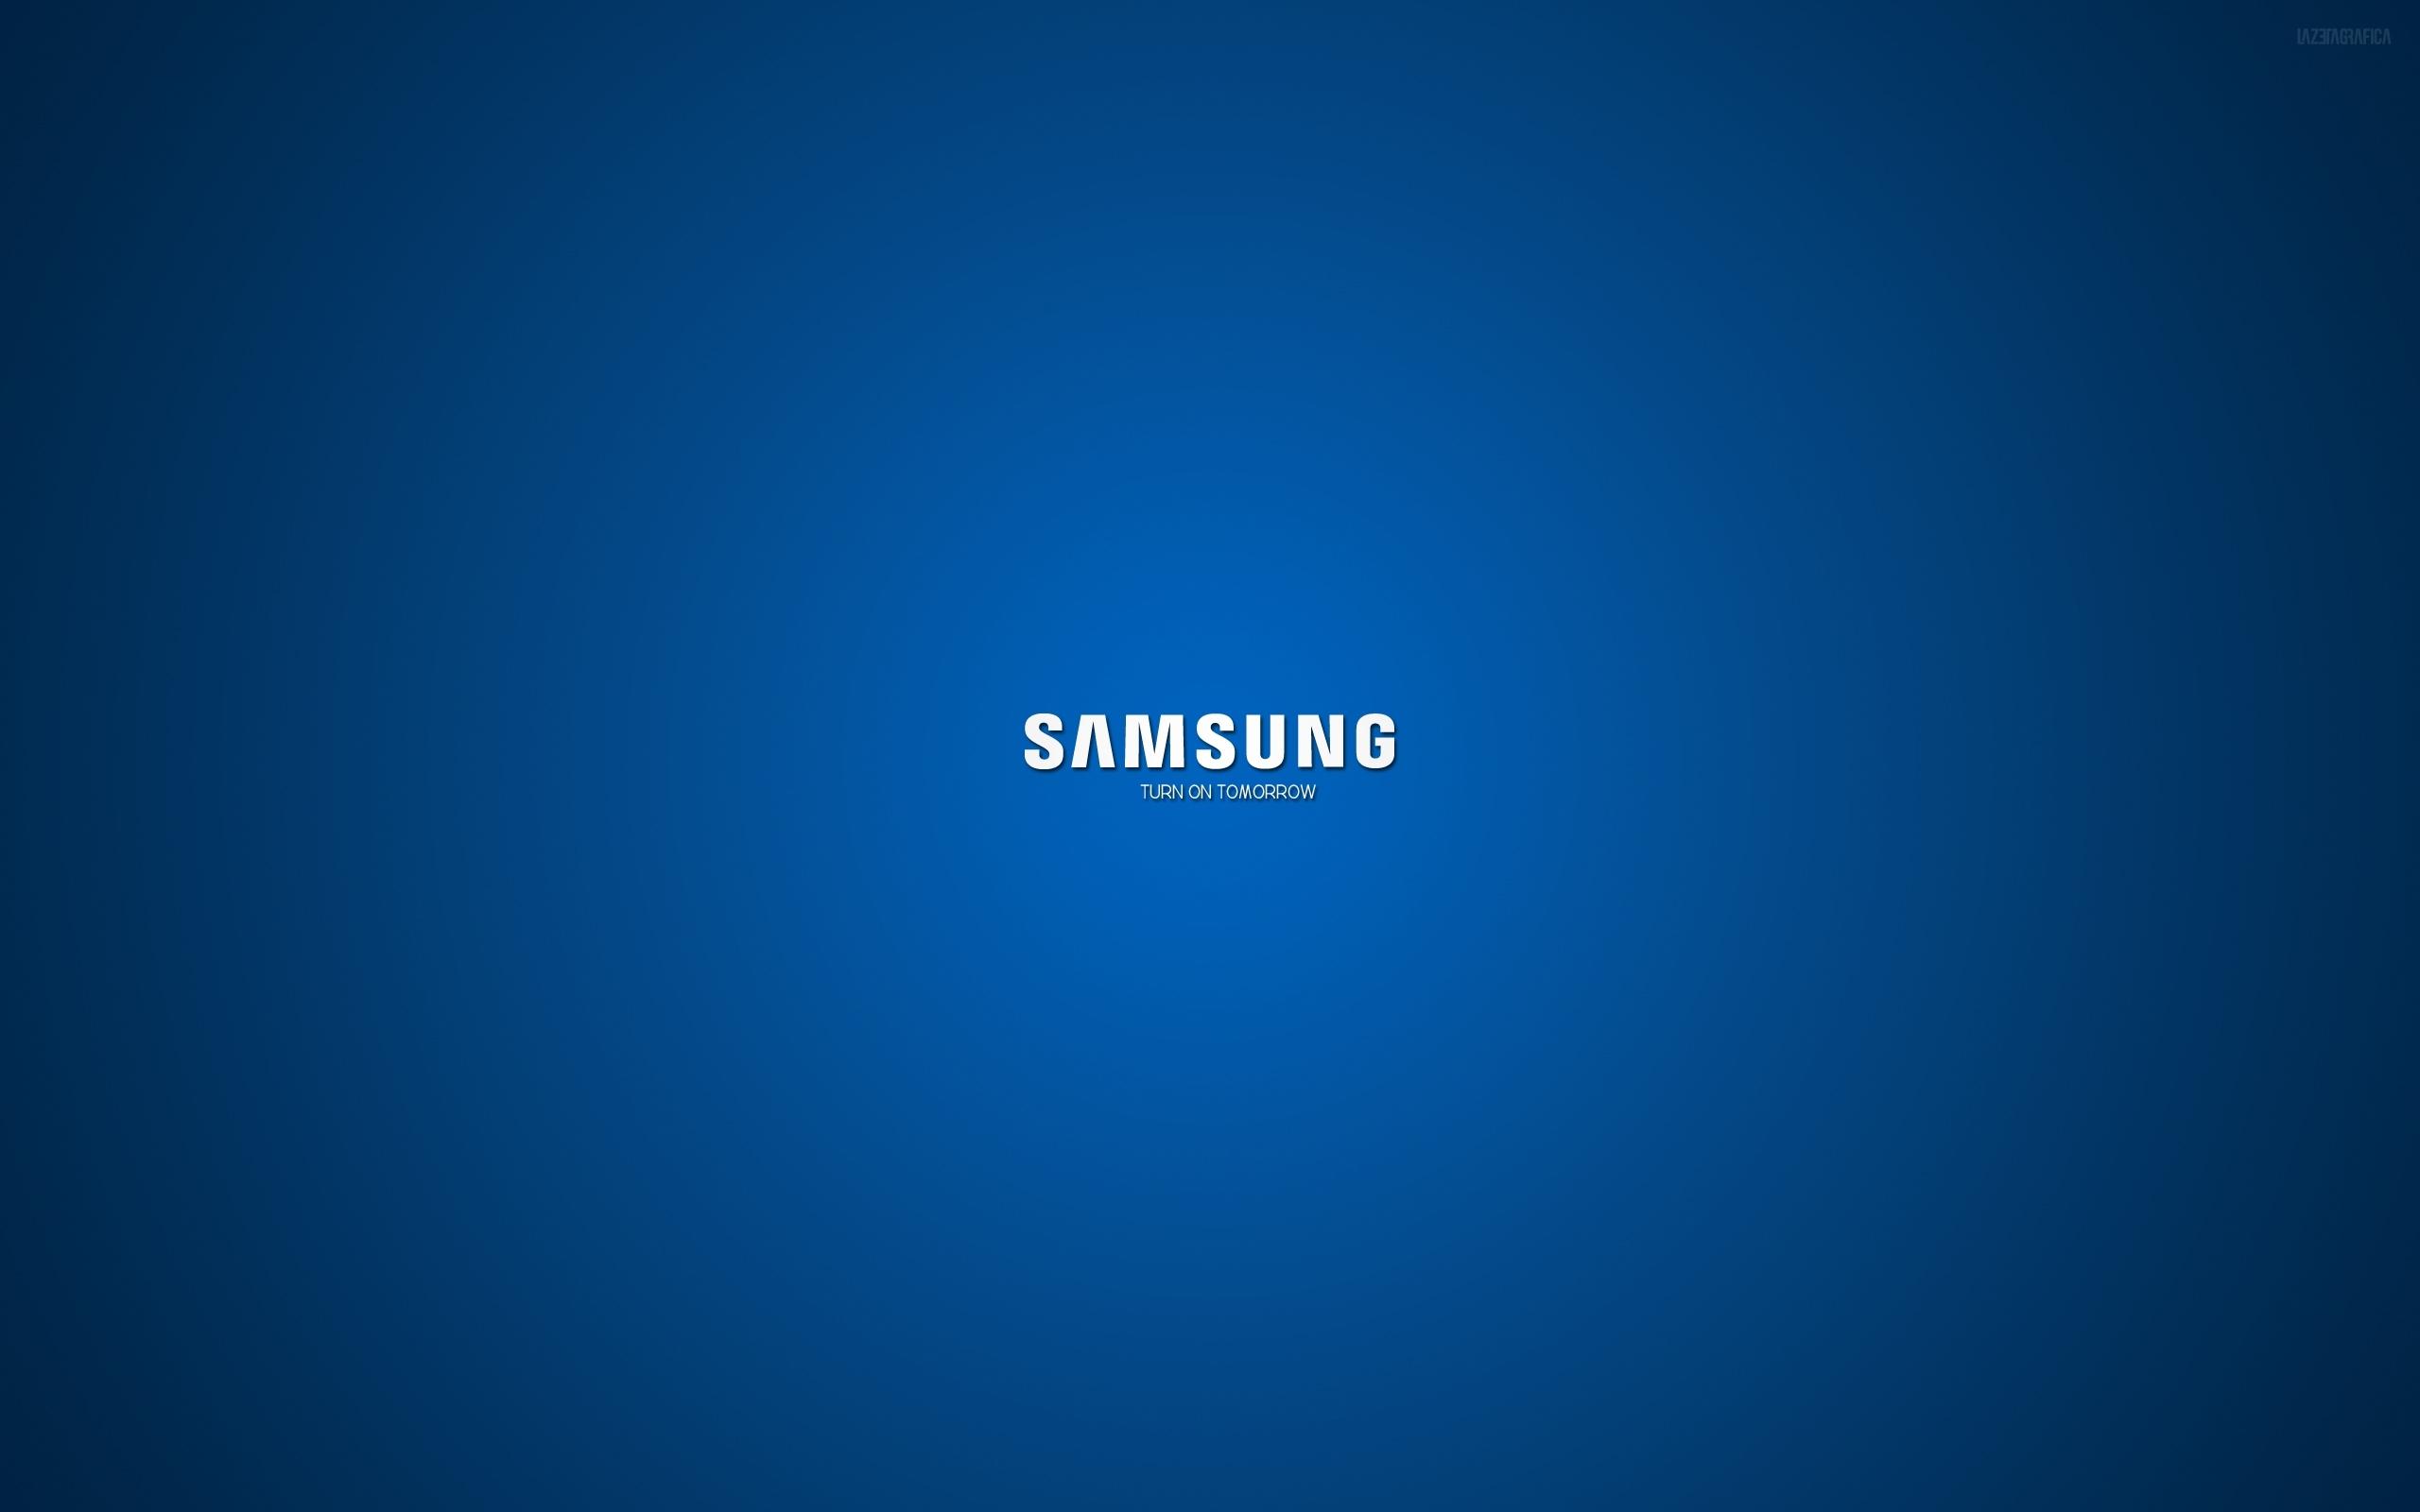 Обои На Рабочий Стол Samsung